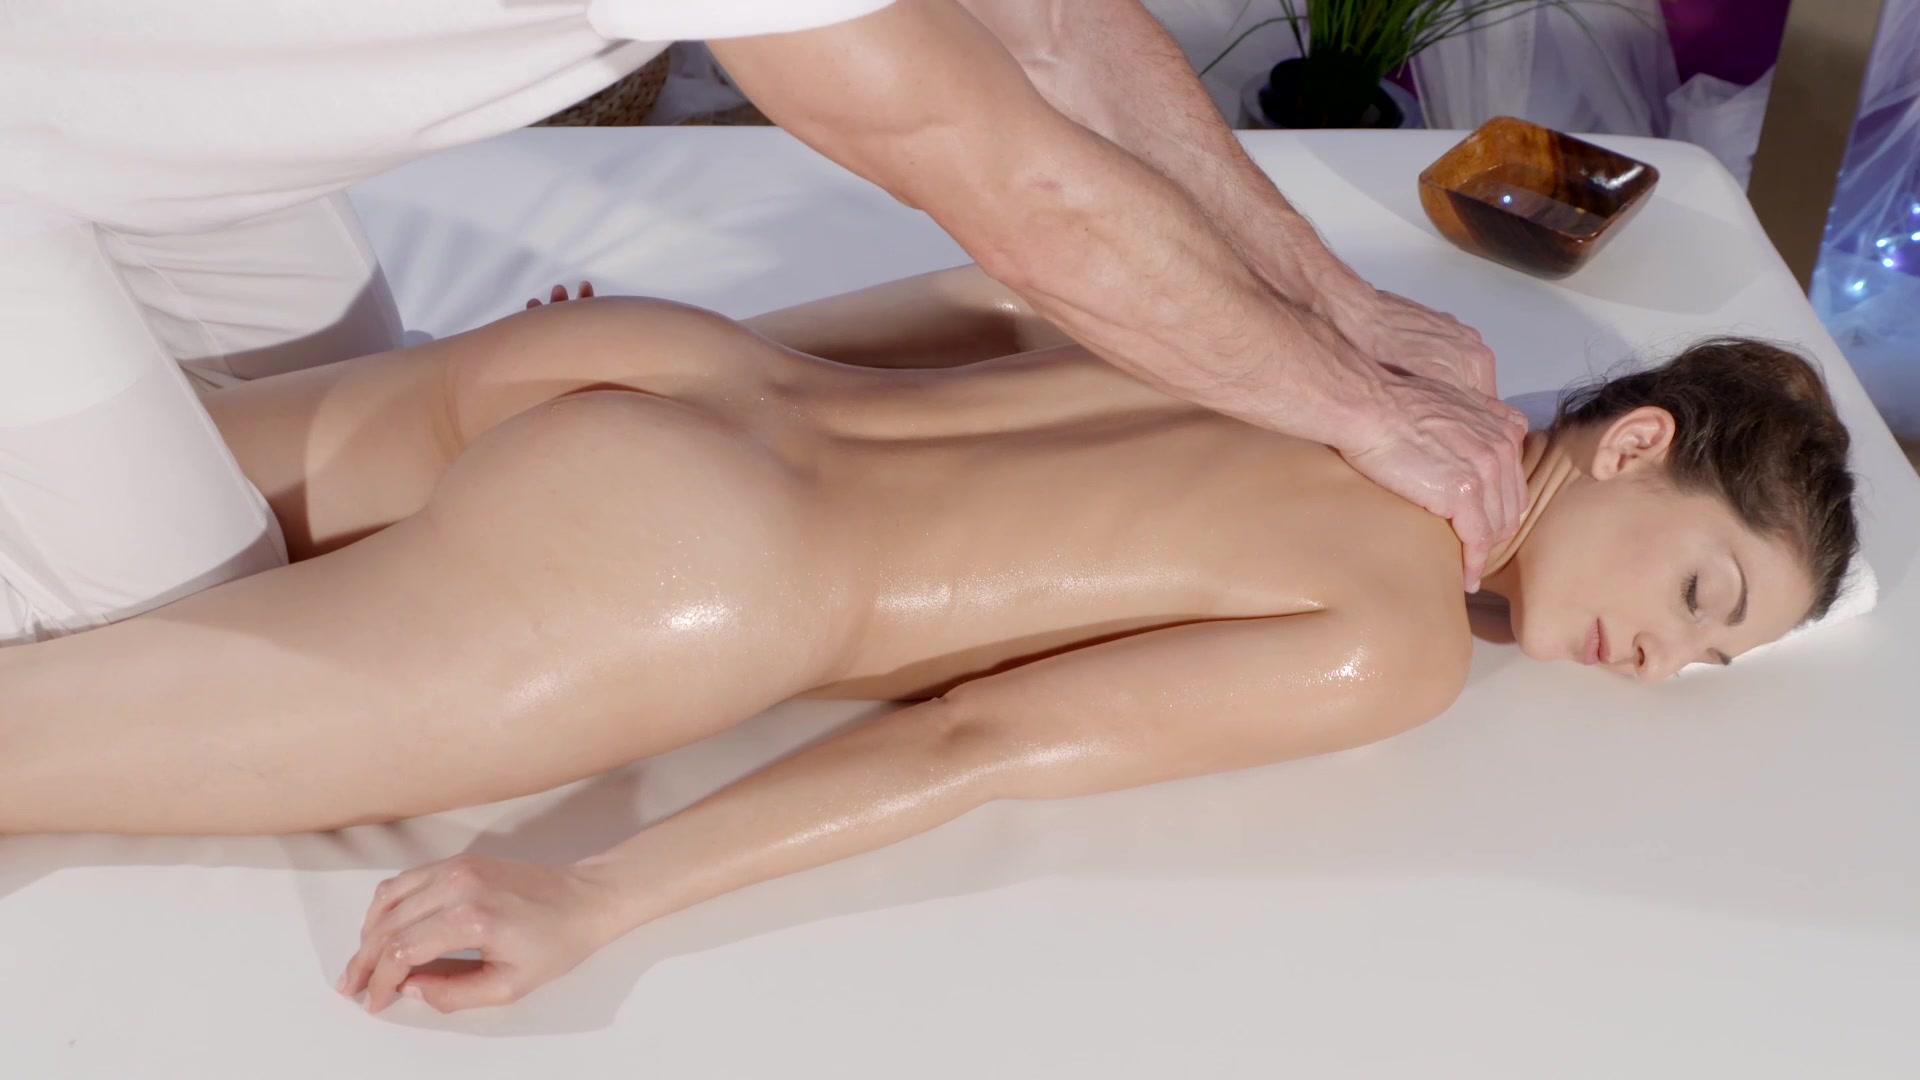 Privat Massage Porn